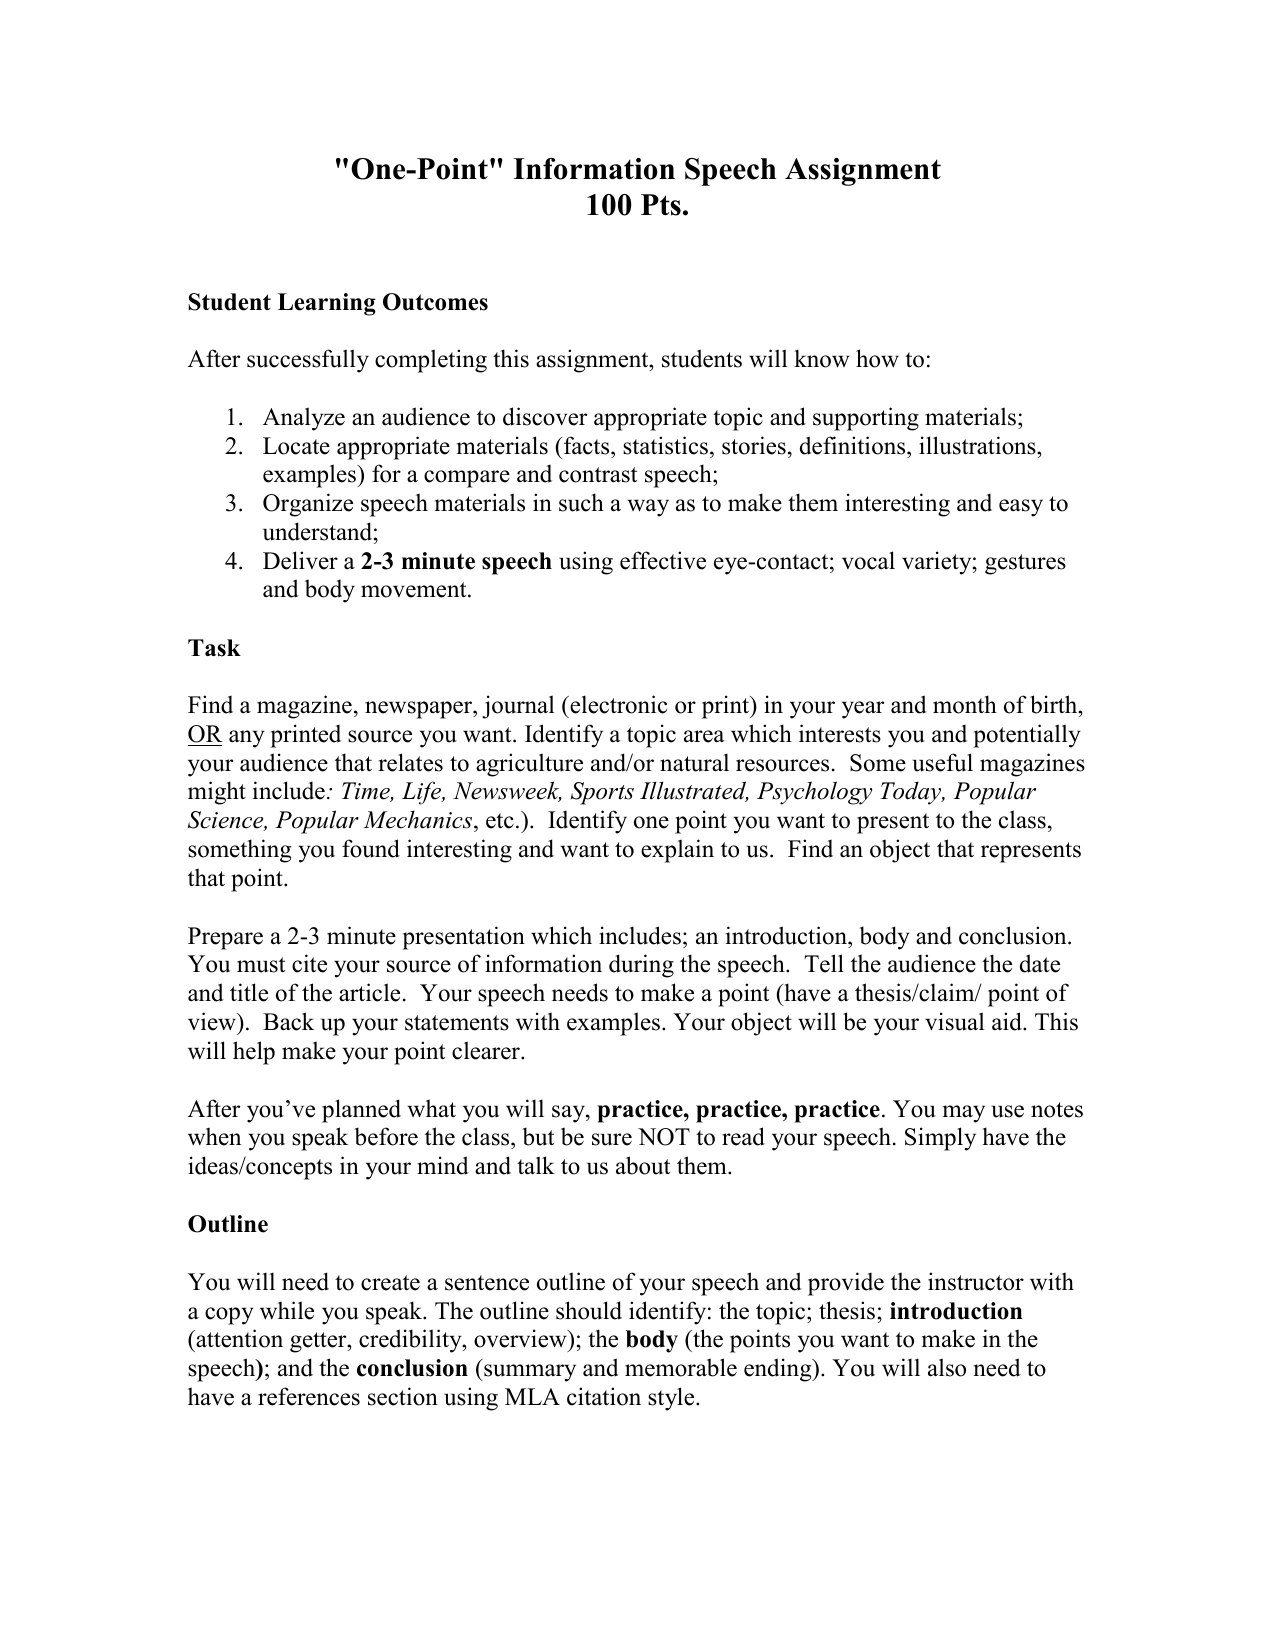 One Point Information Speech Assignment